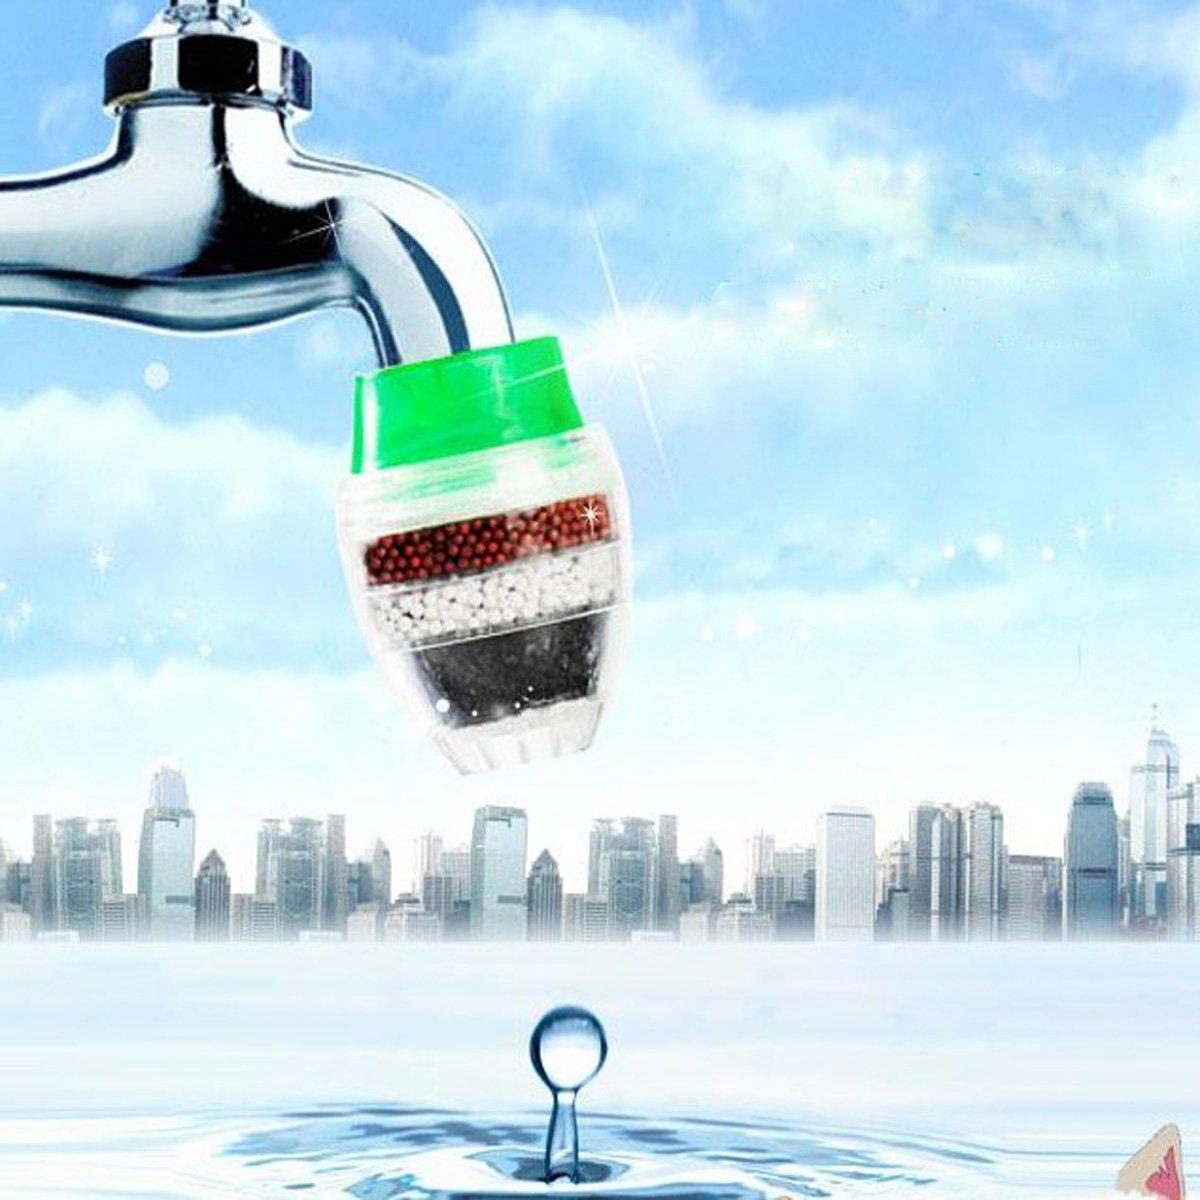 Kitchen Carbon Faucet Tap Water Clean Purifier Filter Cartridge kitchen faucet faucet aerator water purifier sink faucet aerator moen kitchen faucet by Randall Elliott